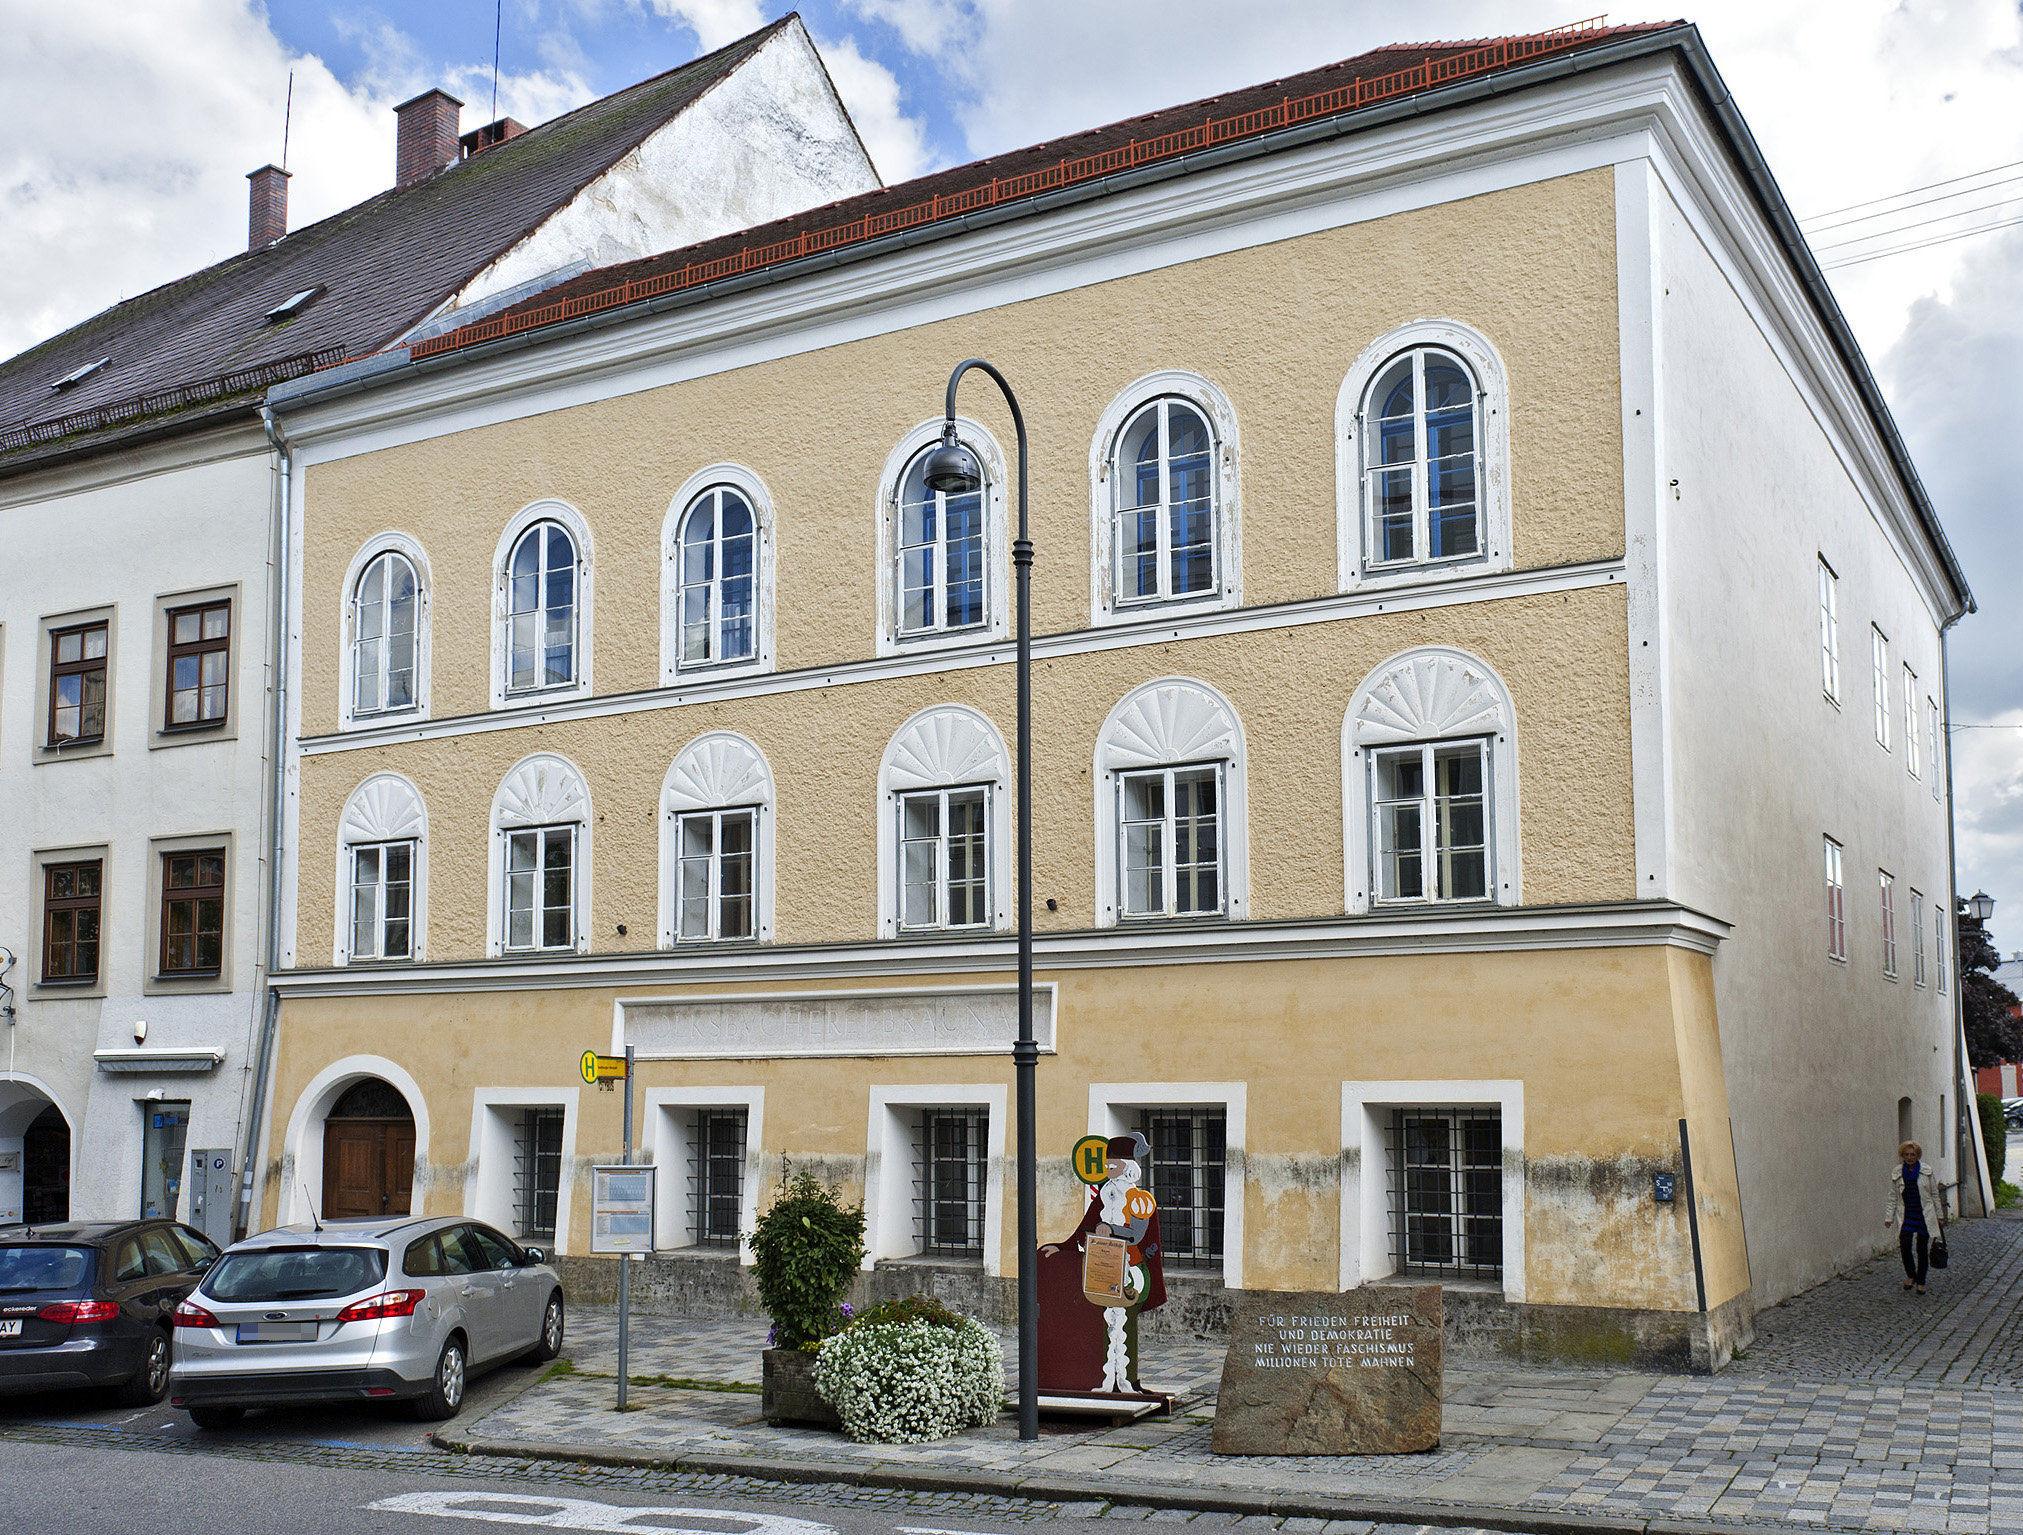 La casa di Adolf Hitler a Braunau am Inn